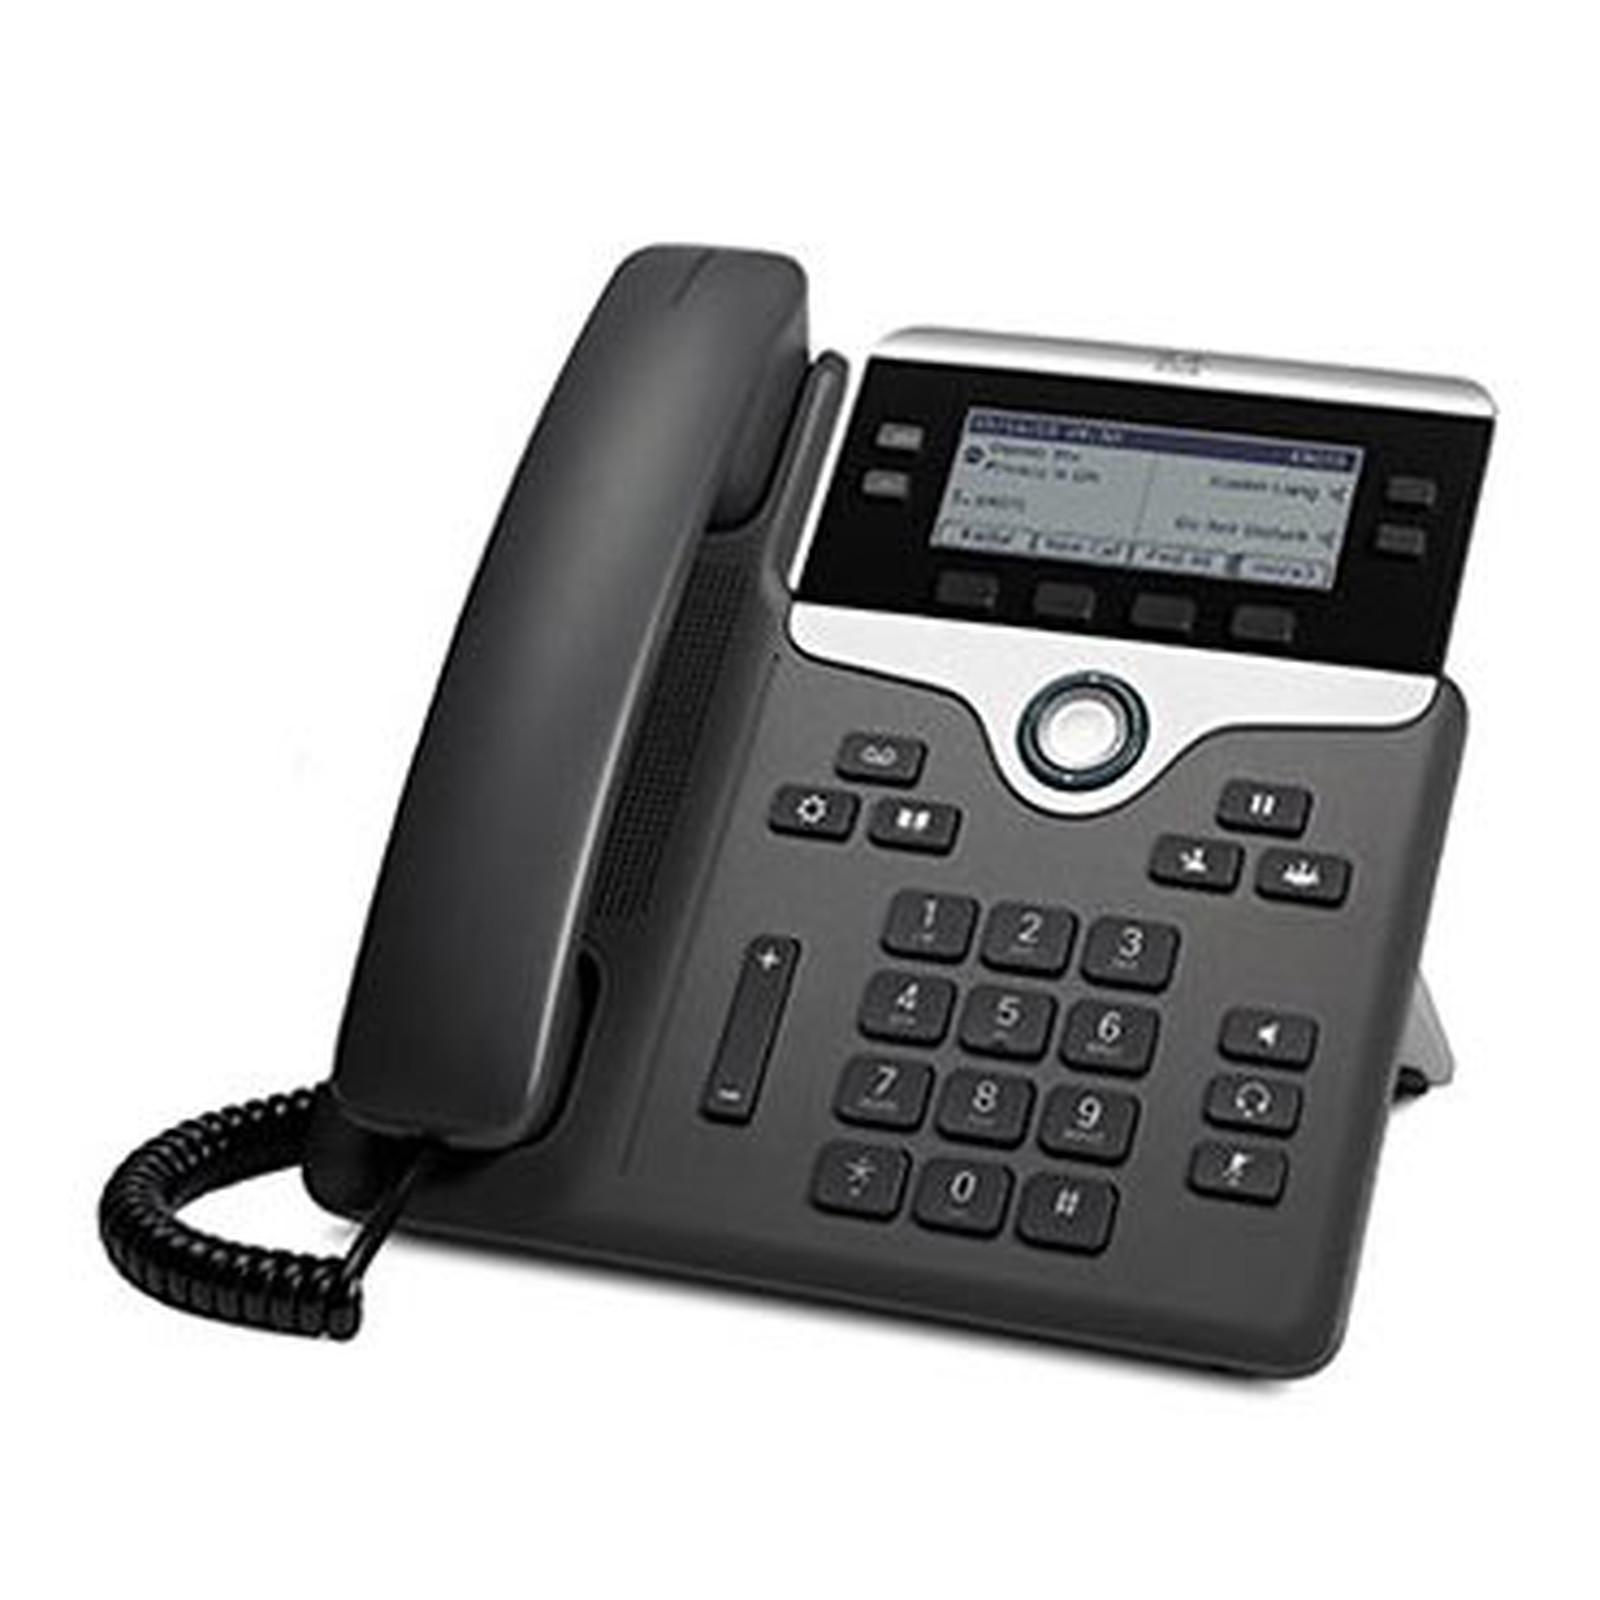 Cisco IP Phone 7841 avec micrologiciel de téléphone multiplateforme